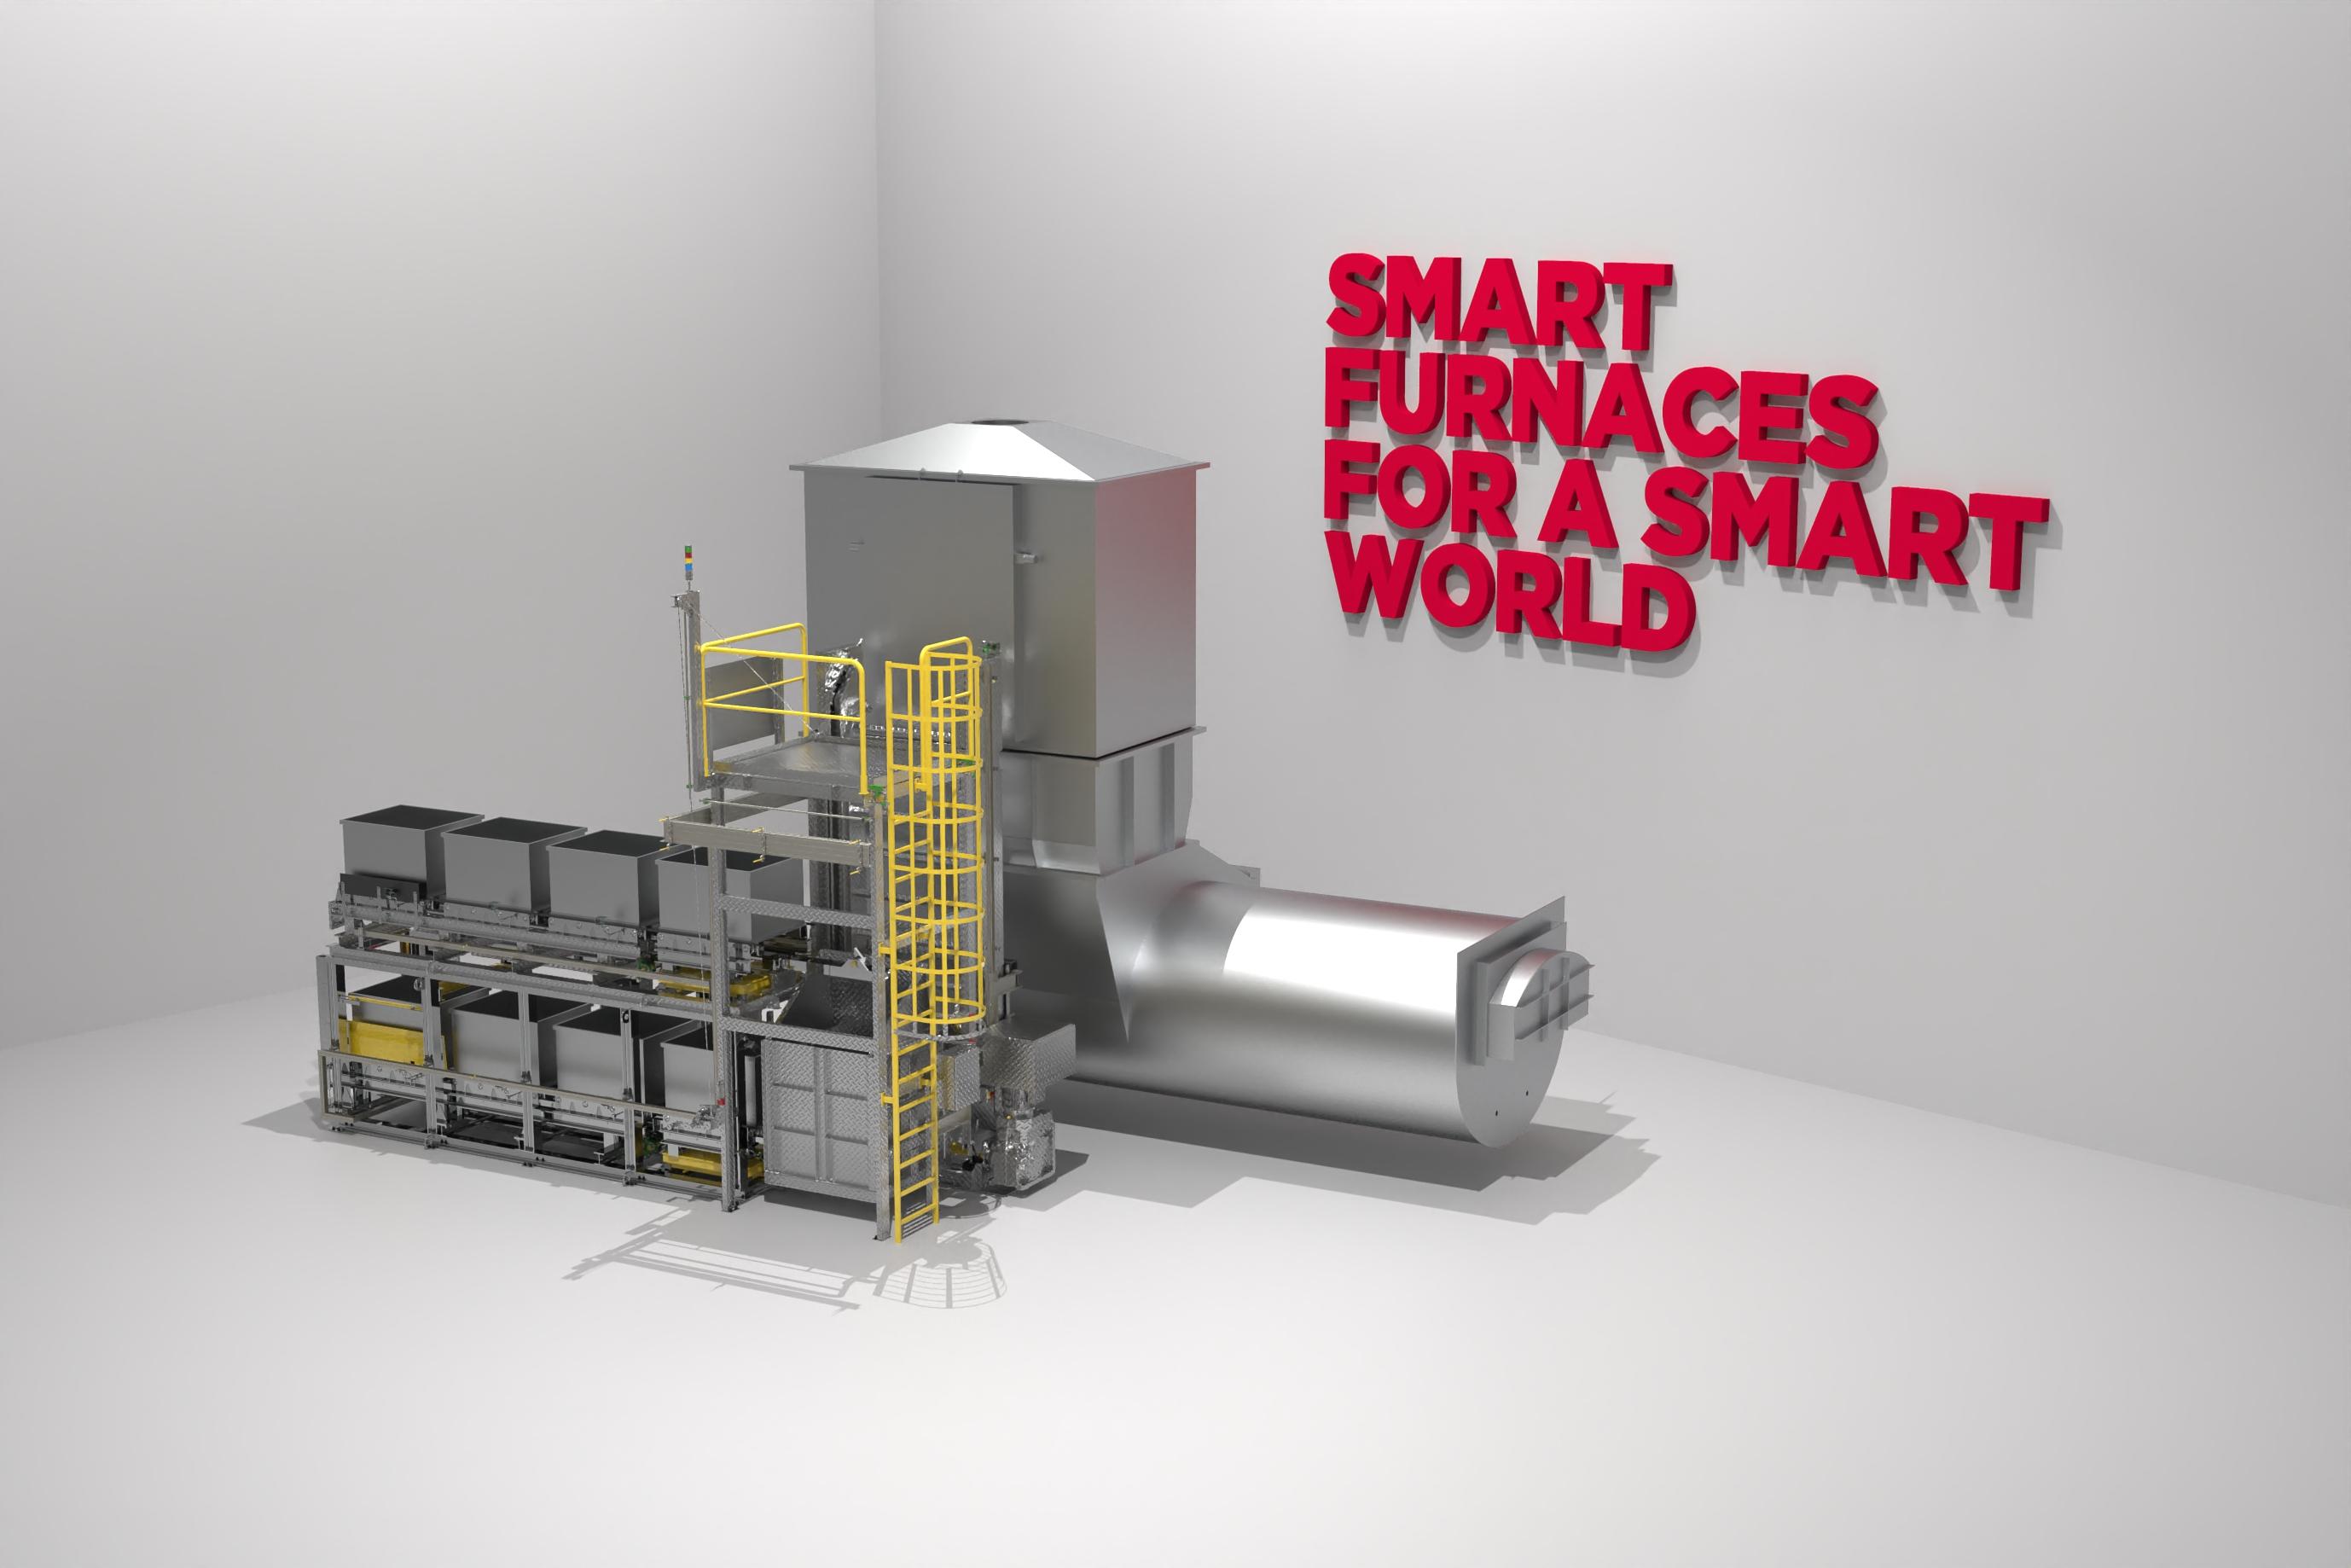 Torre fusora con horno mantenedor integrado GHI